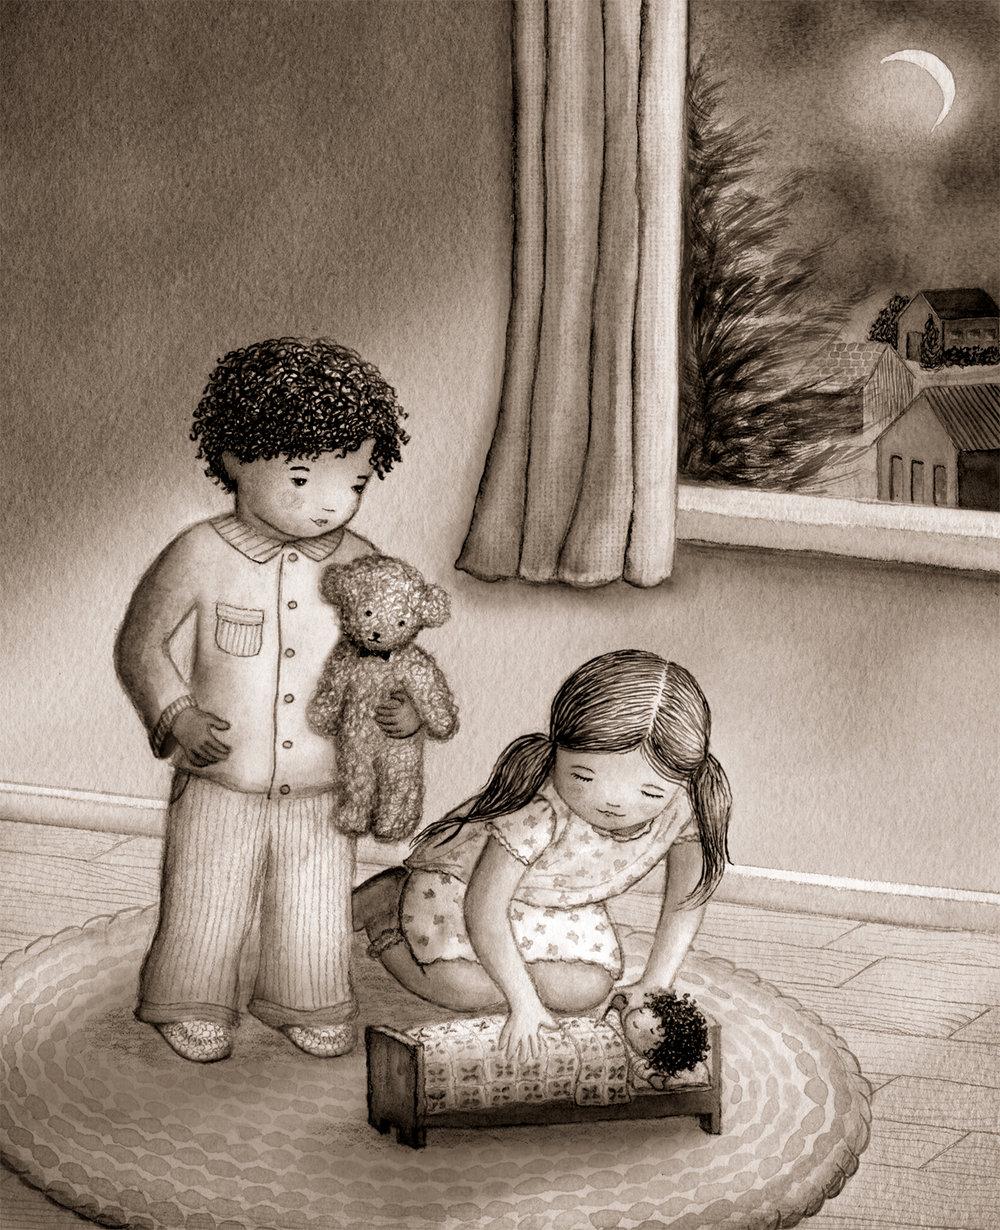 joy_dabby_bedtime.jpg